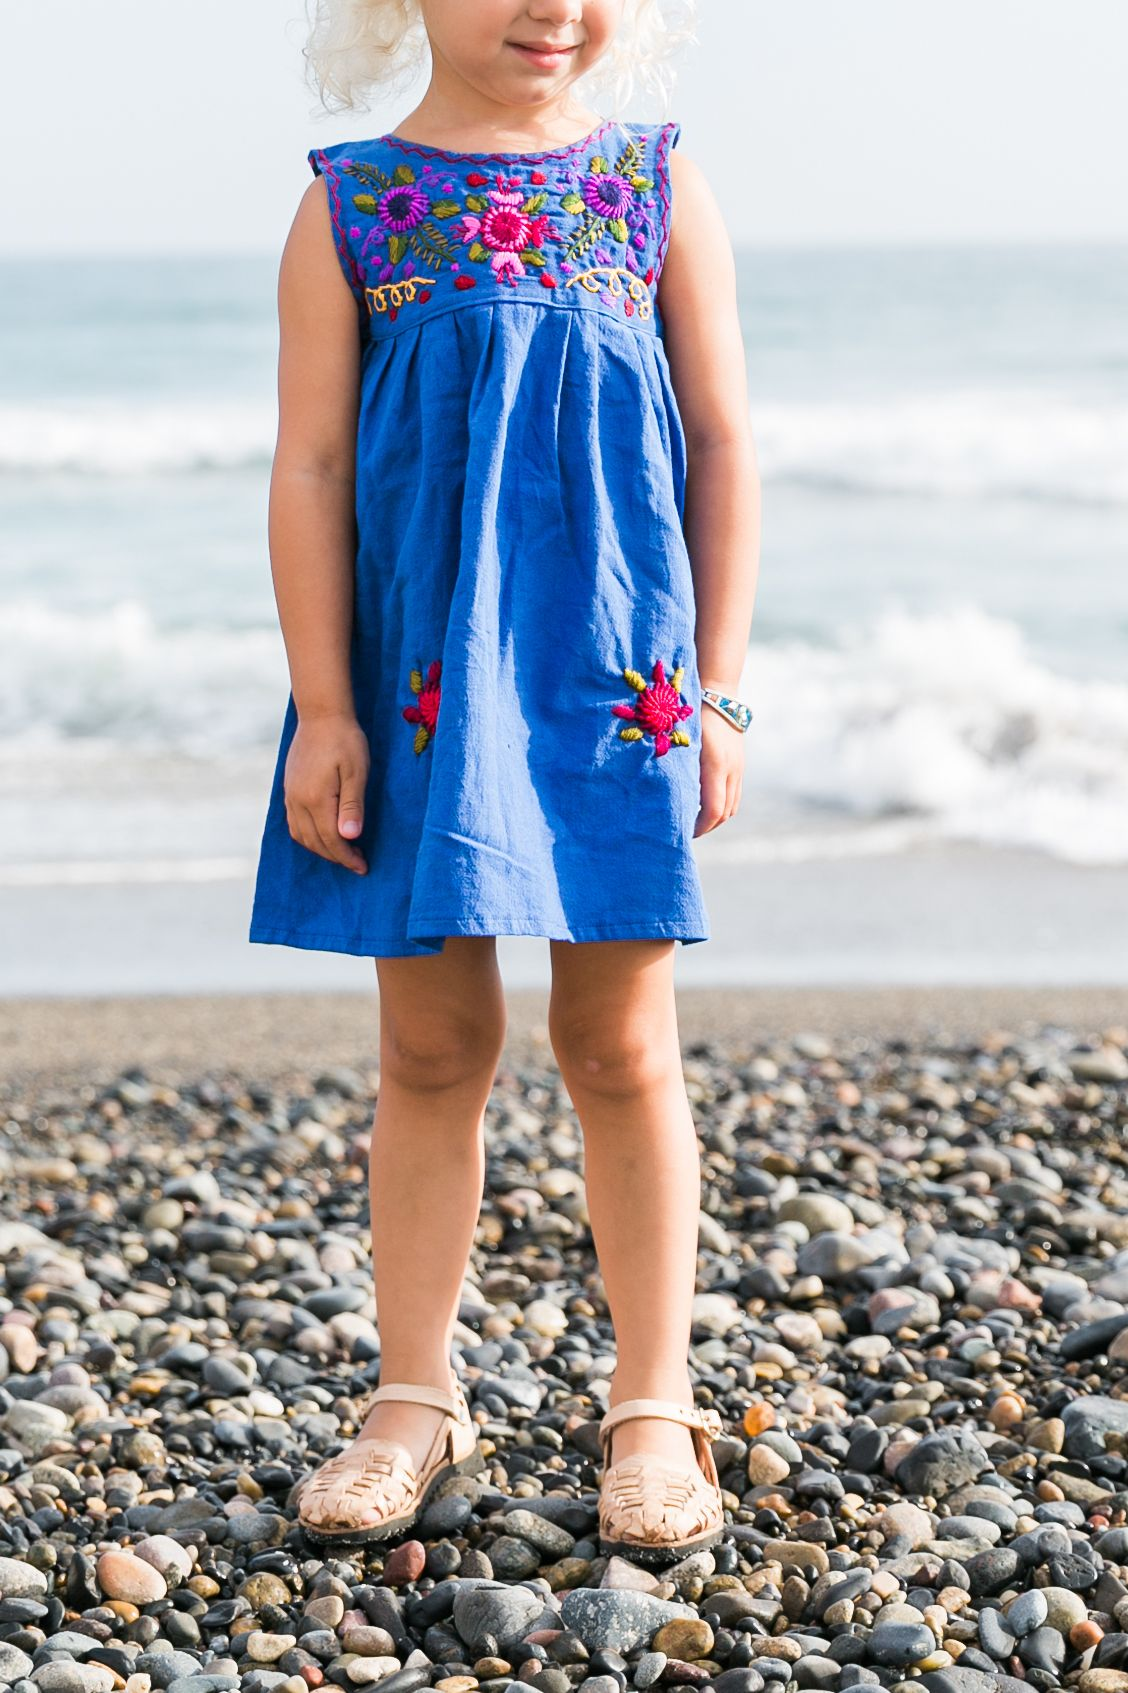 52e3c7a1a Flores Baby Dress-Azul // Children's Huaraches Sandals www.humblehilo.com